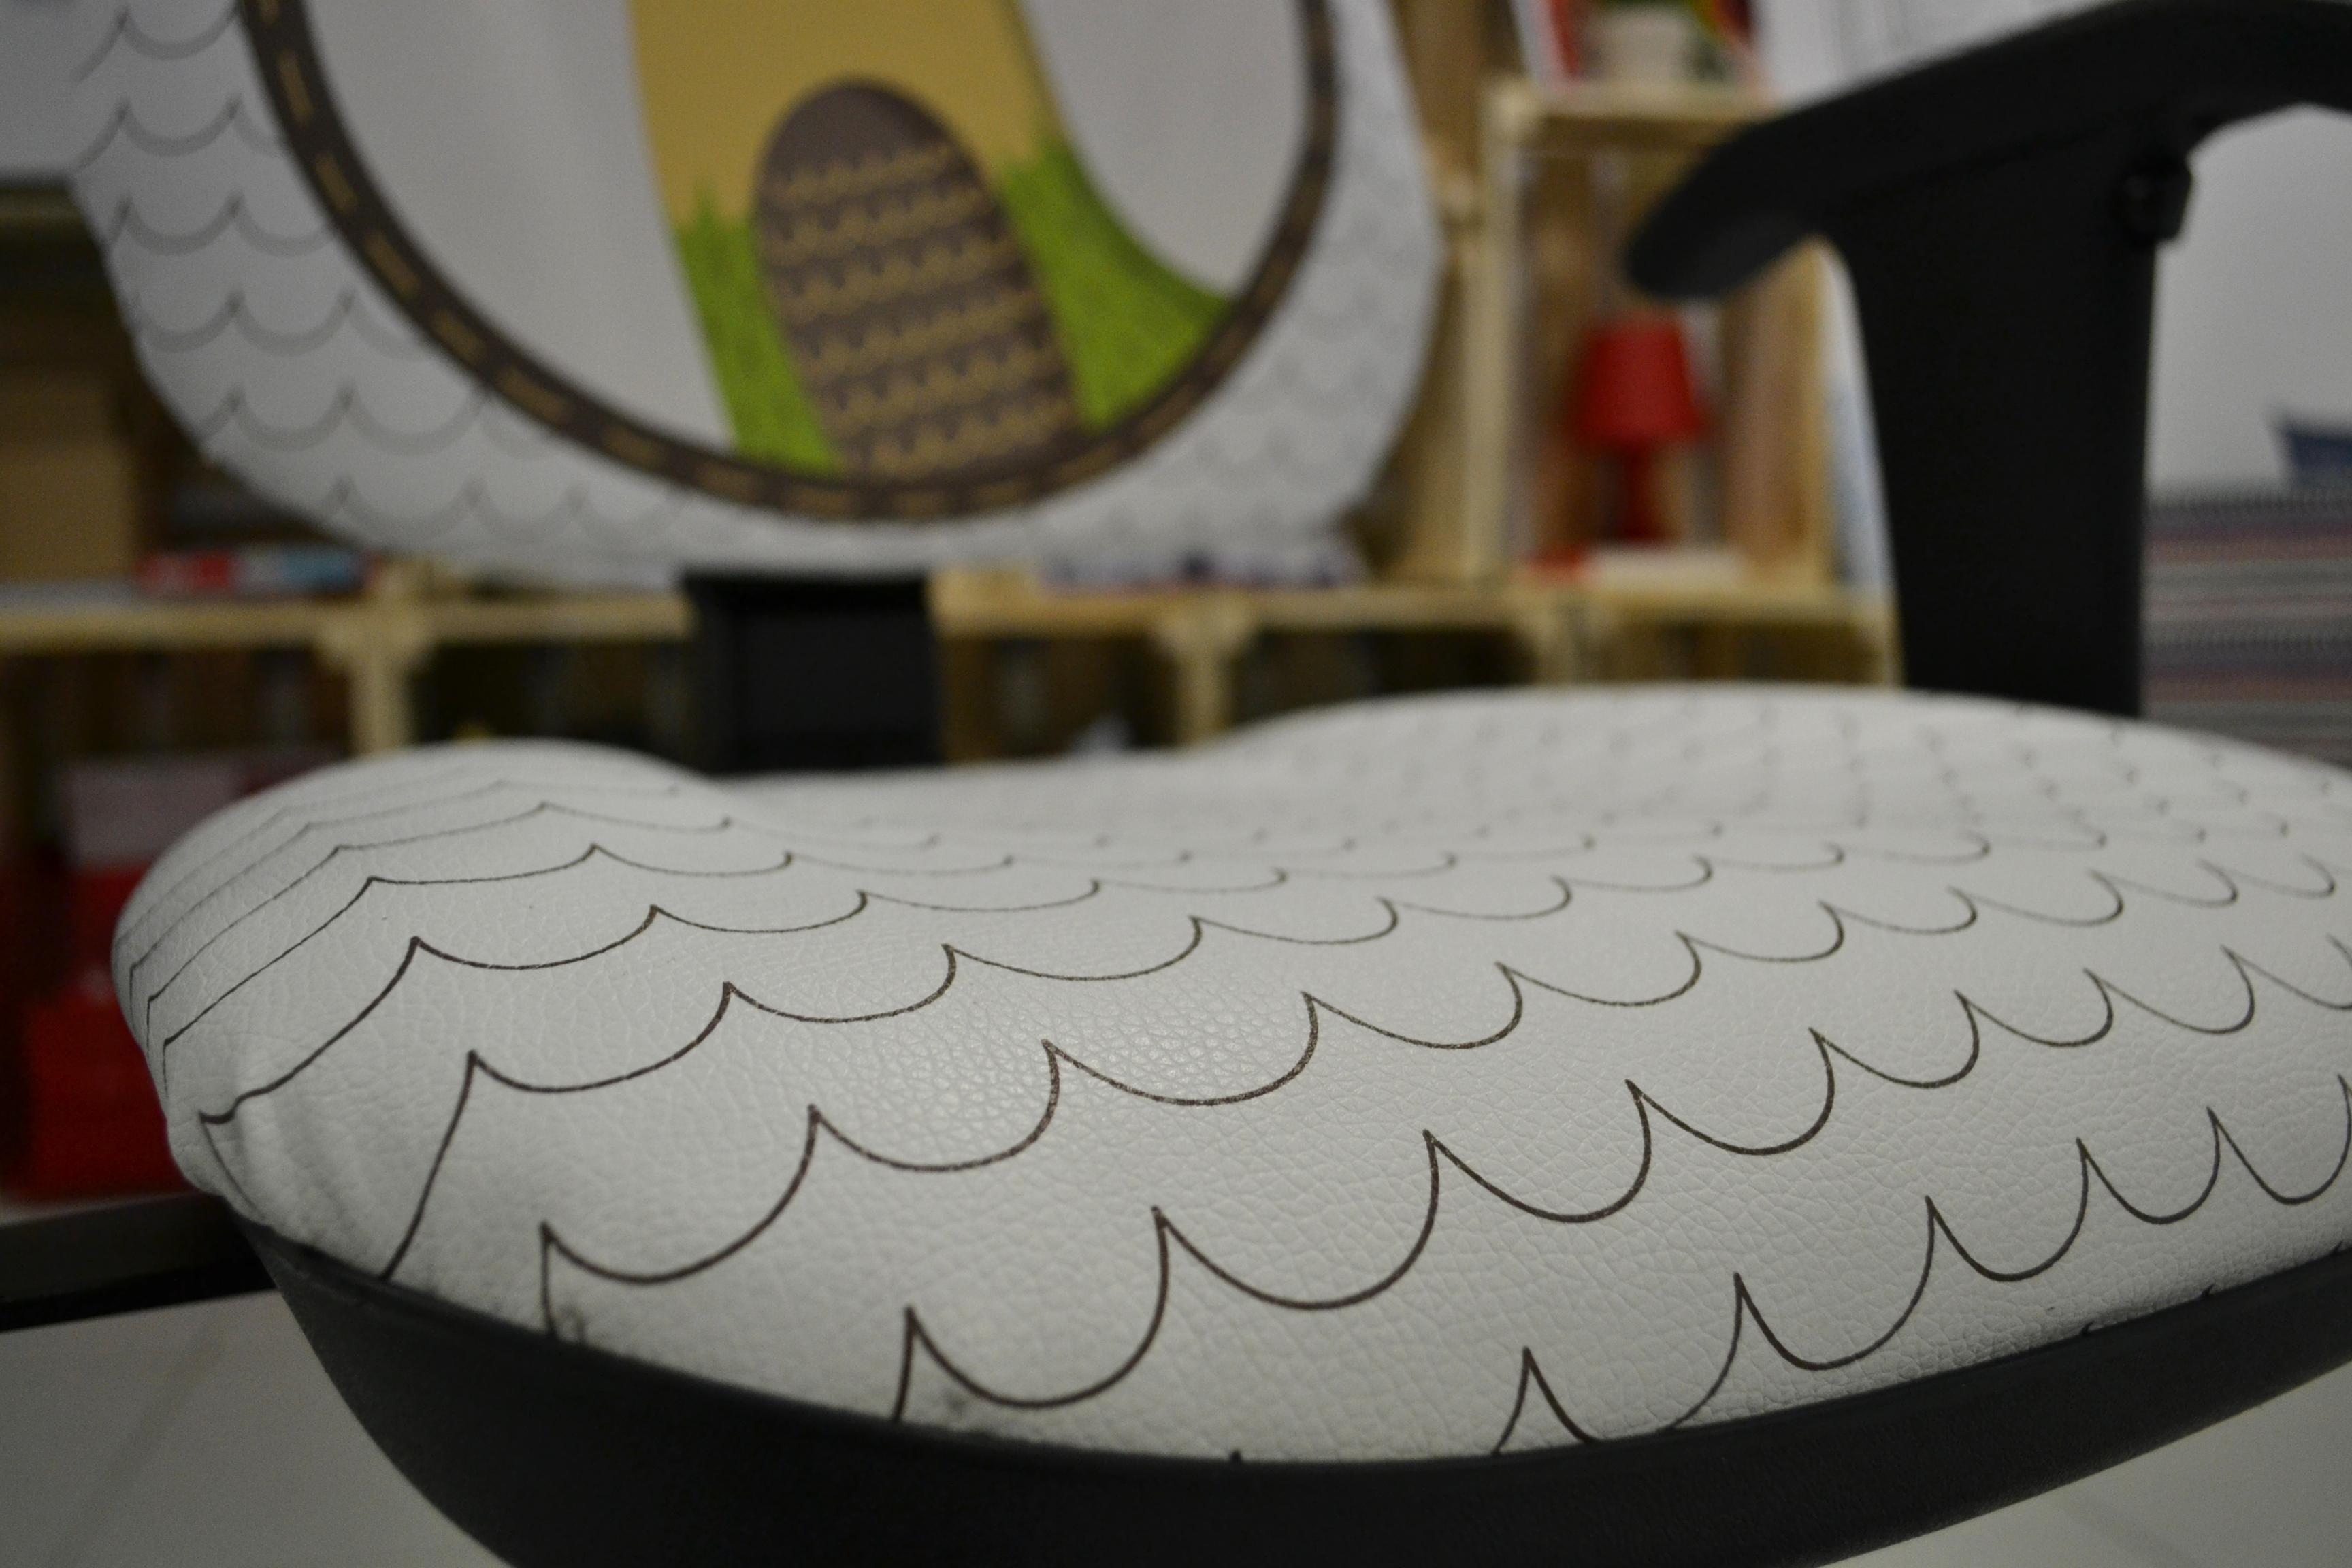 C mo tapizar una silla con polipiel estampable - Tapizar una silla ...